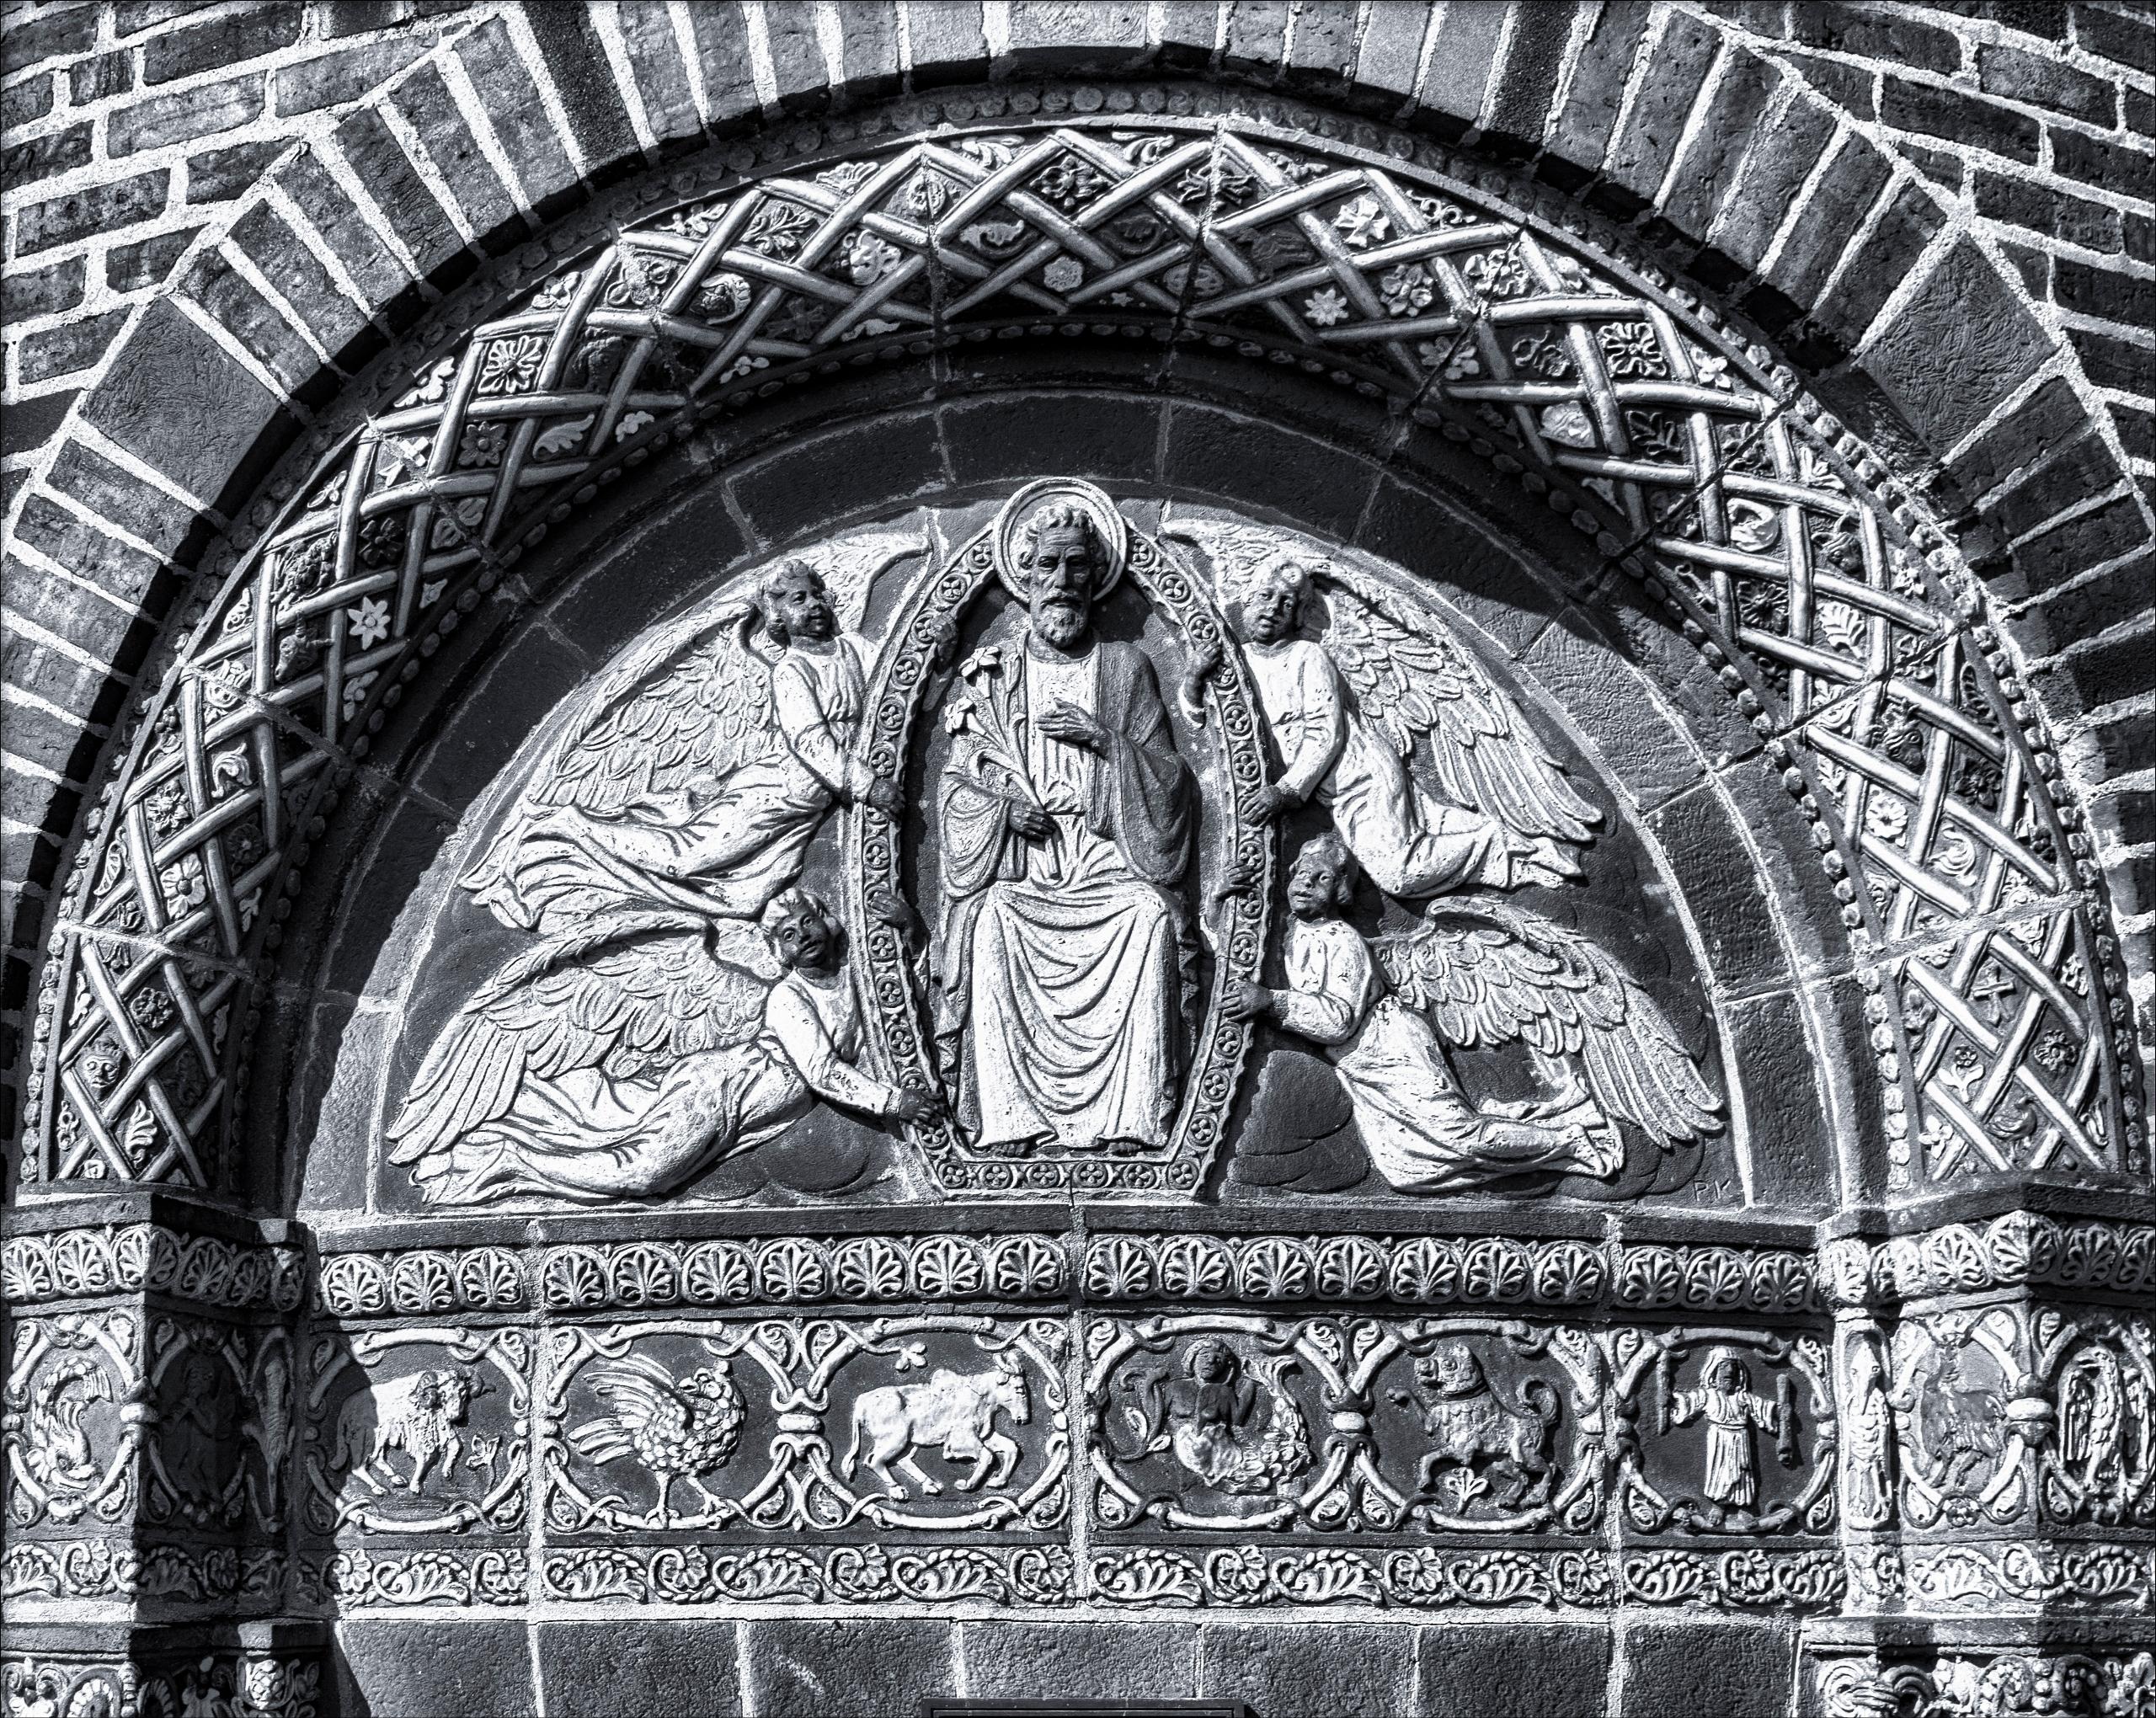 Architectural detail doors orat - docdenny | ello